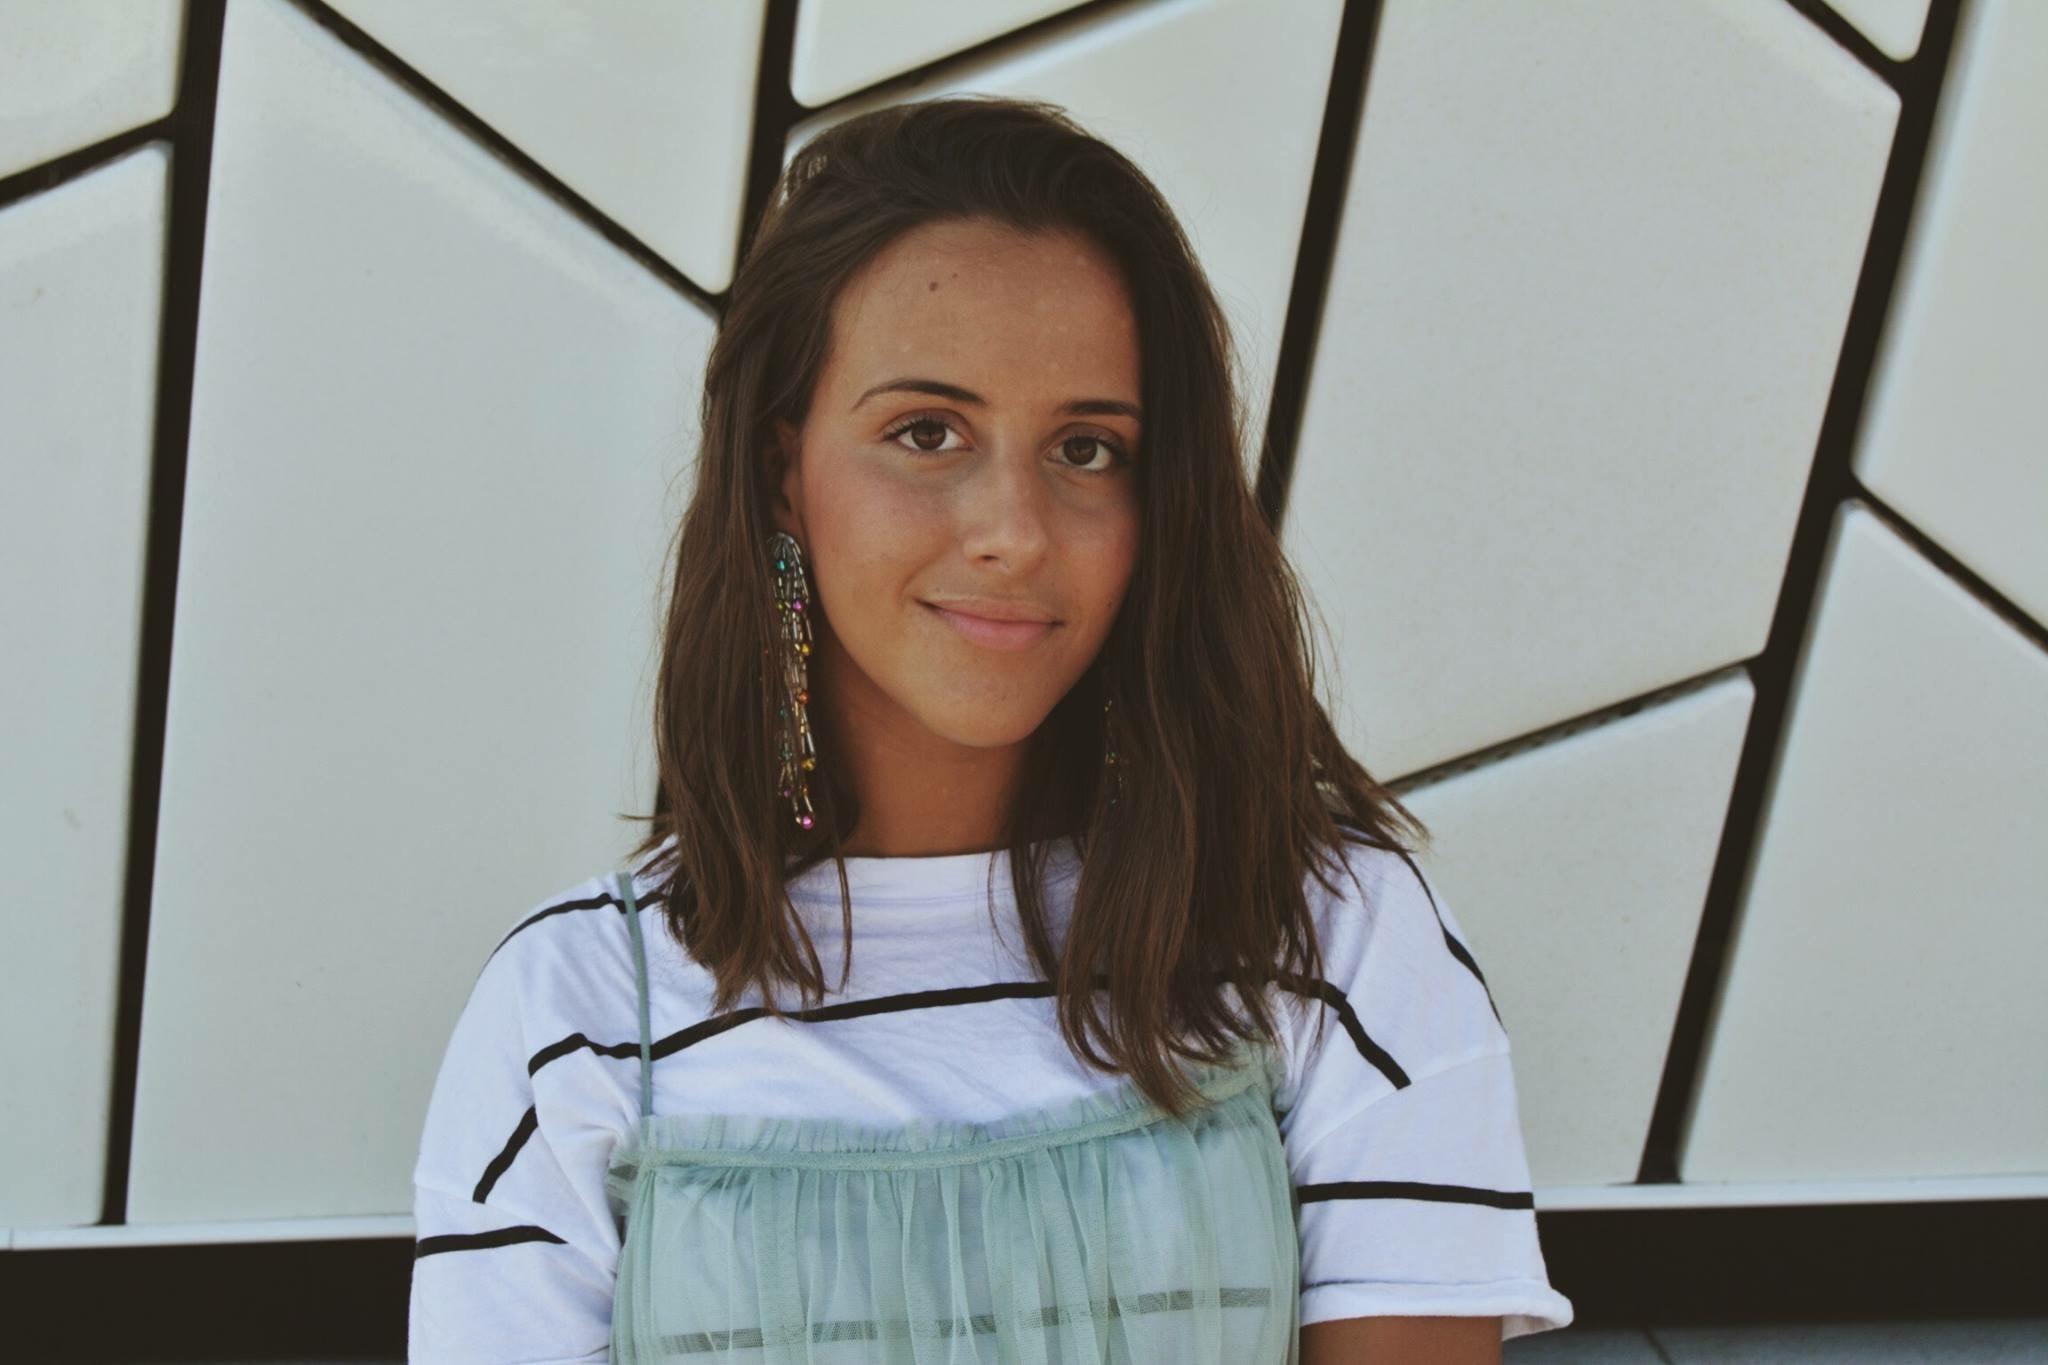 Go to Madalena Veloso's profile